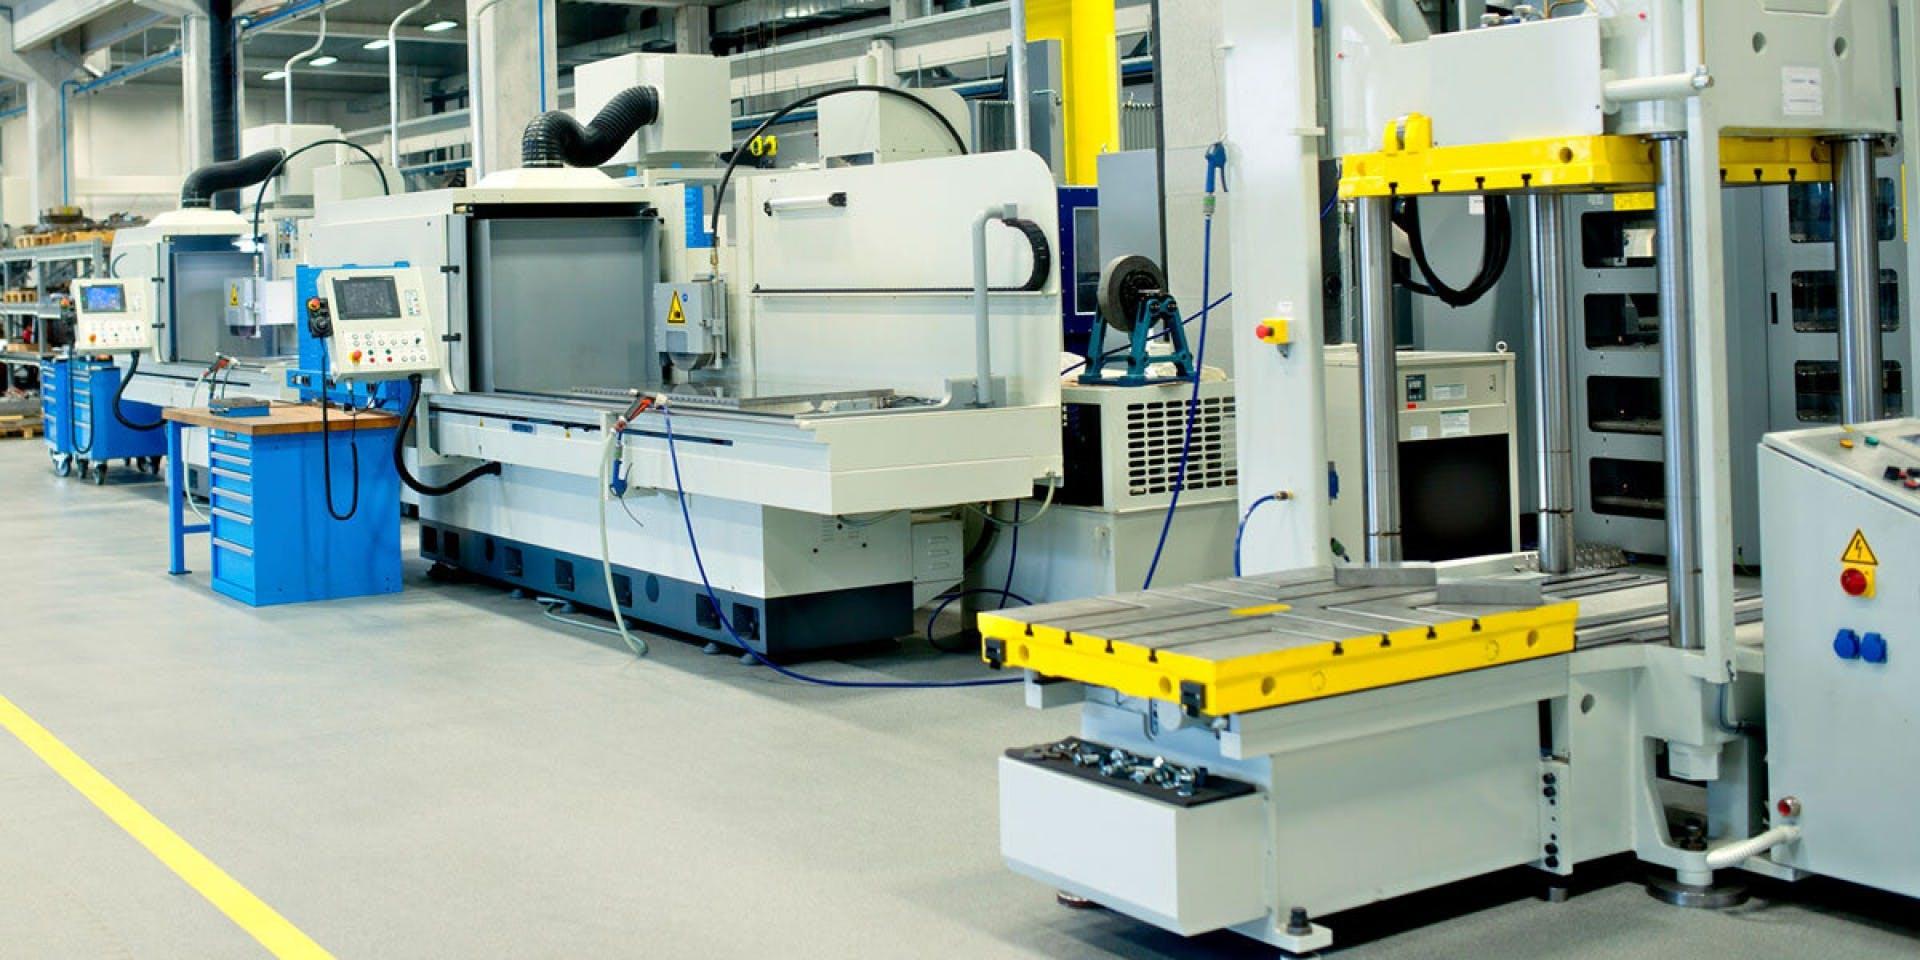 Steel Surfaces - Processing industry Hero Image